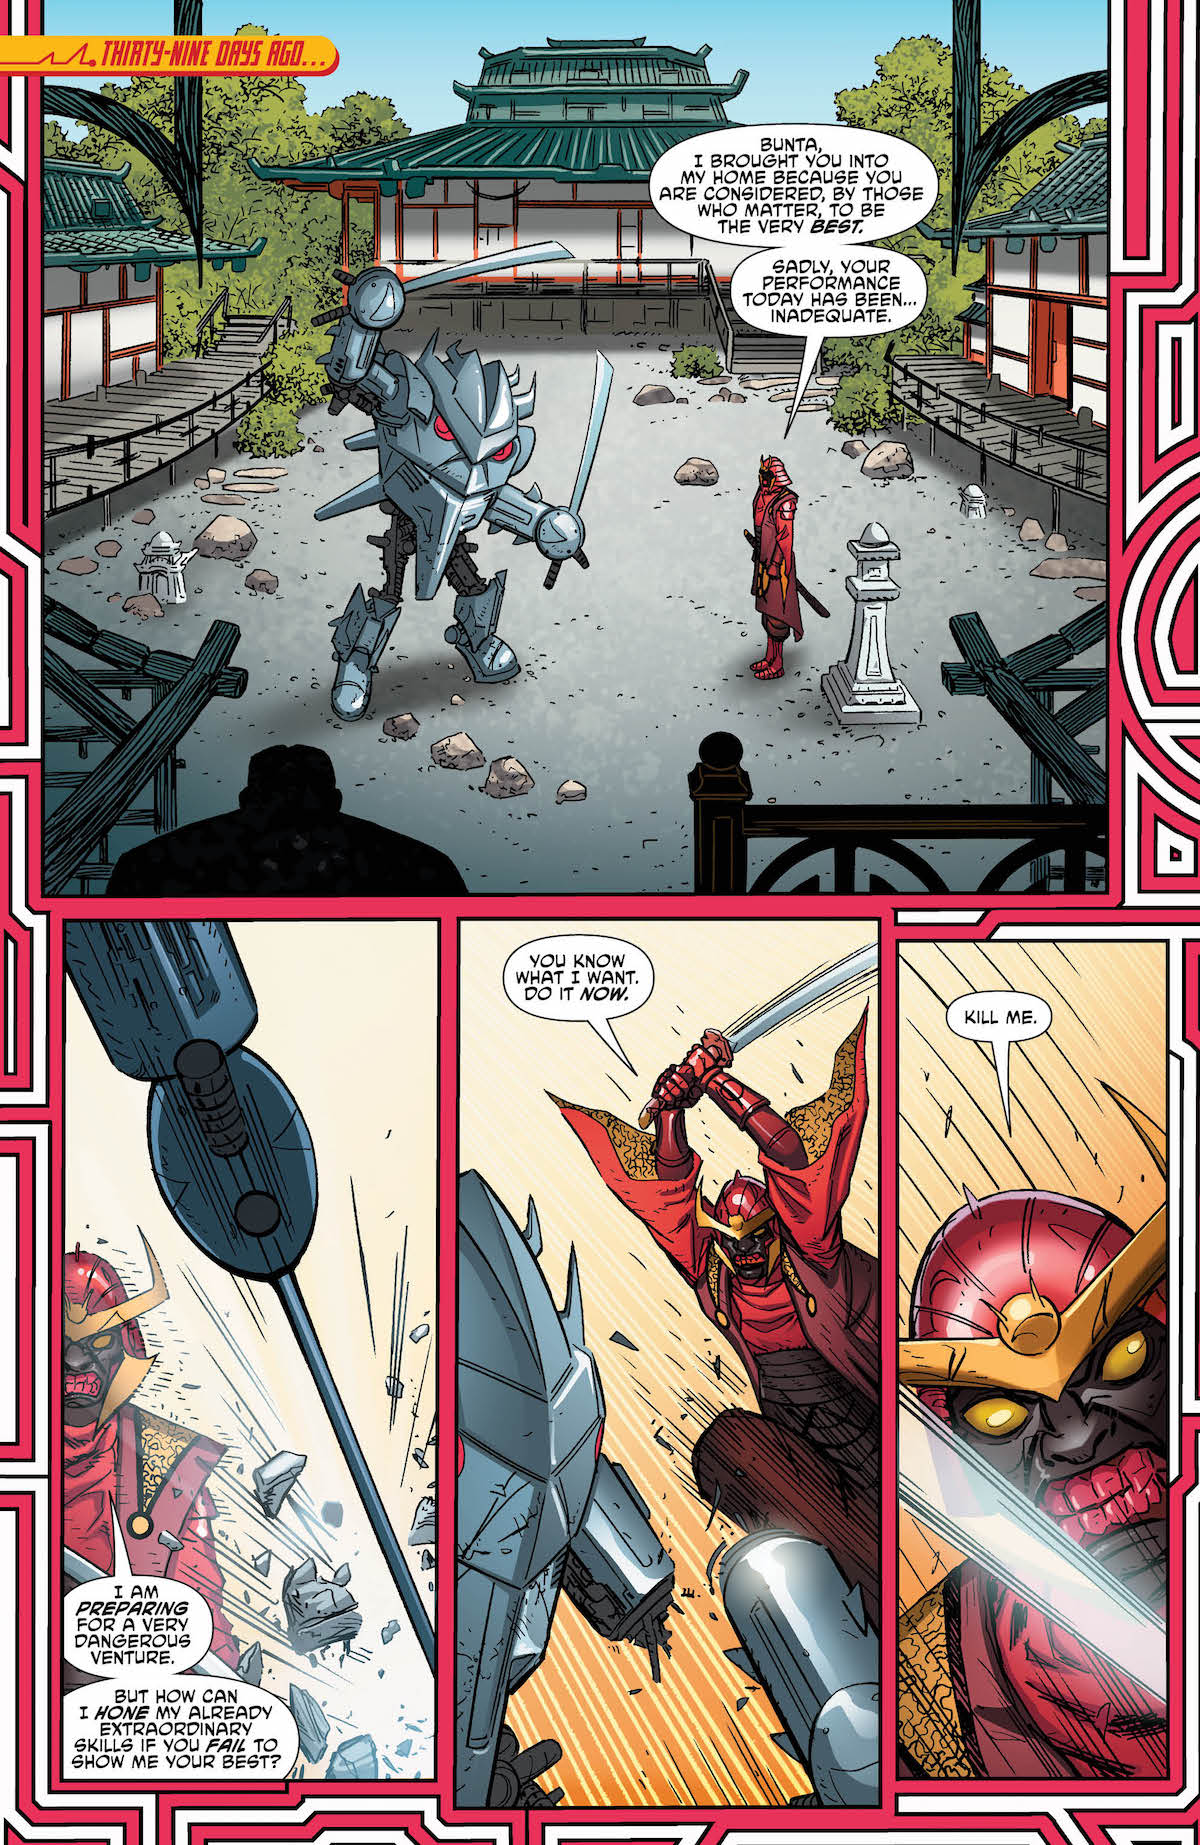 Cyborg #21 page 1